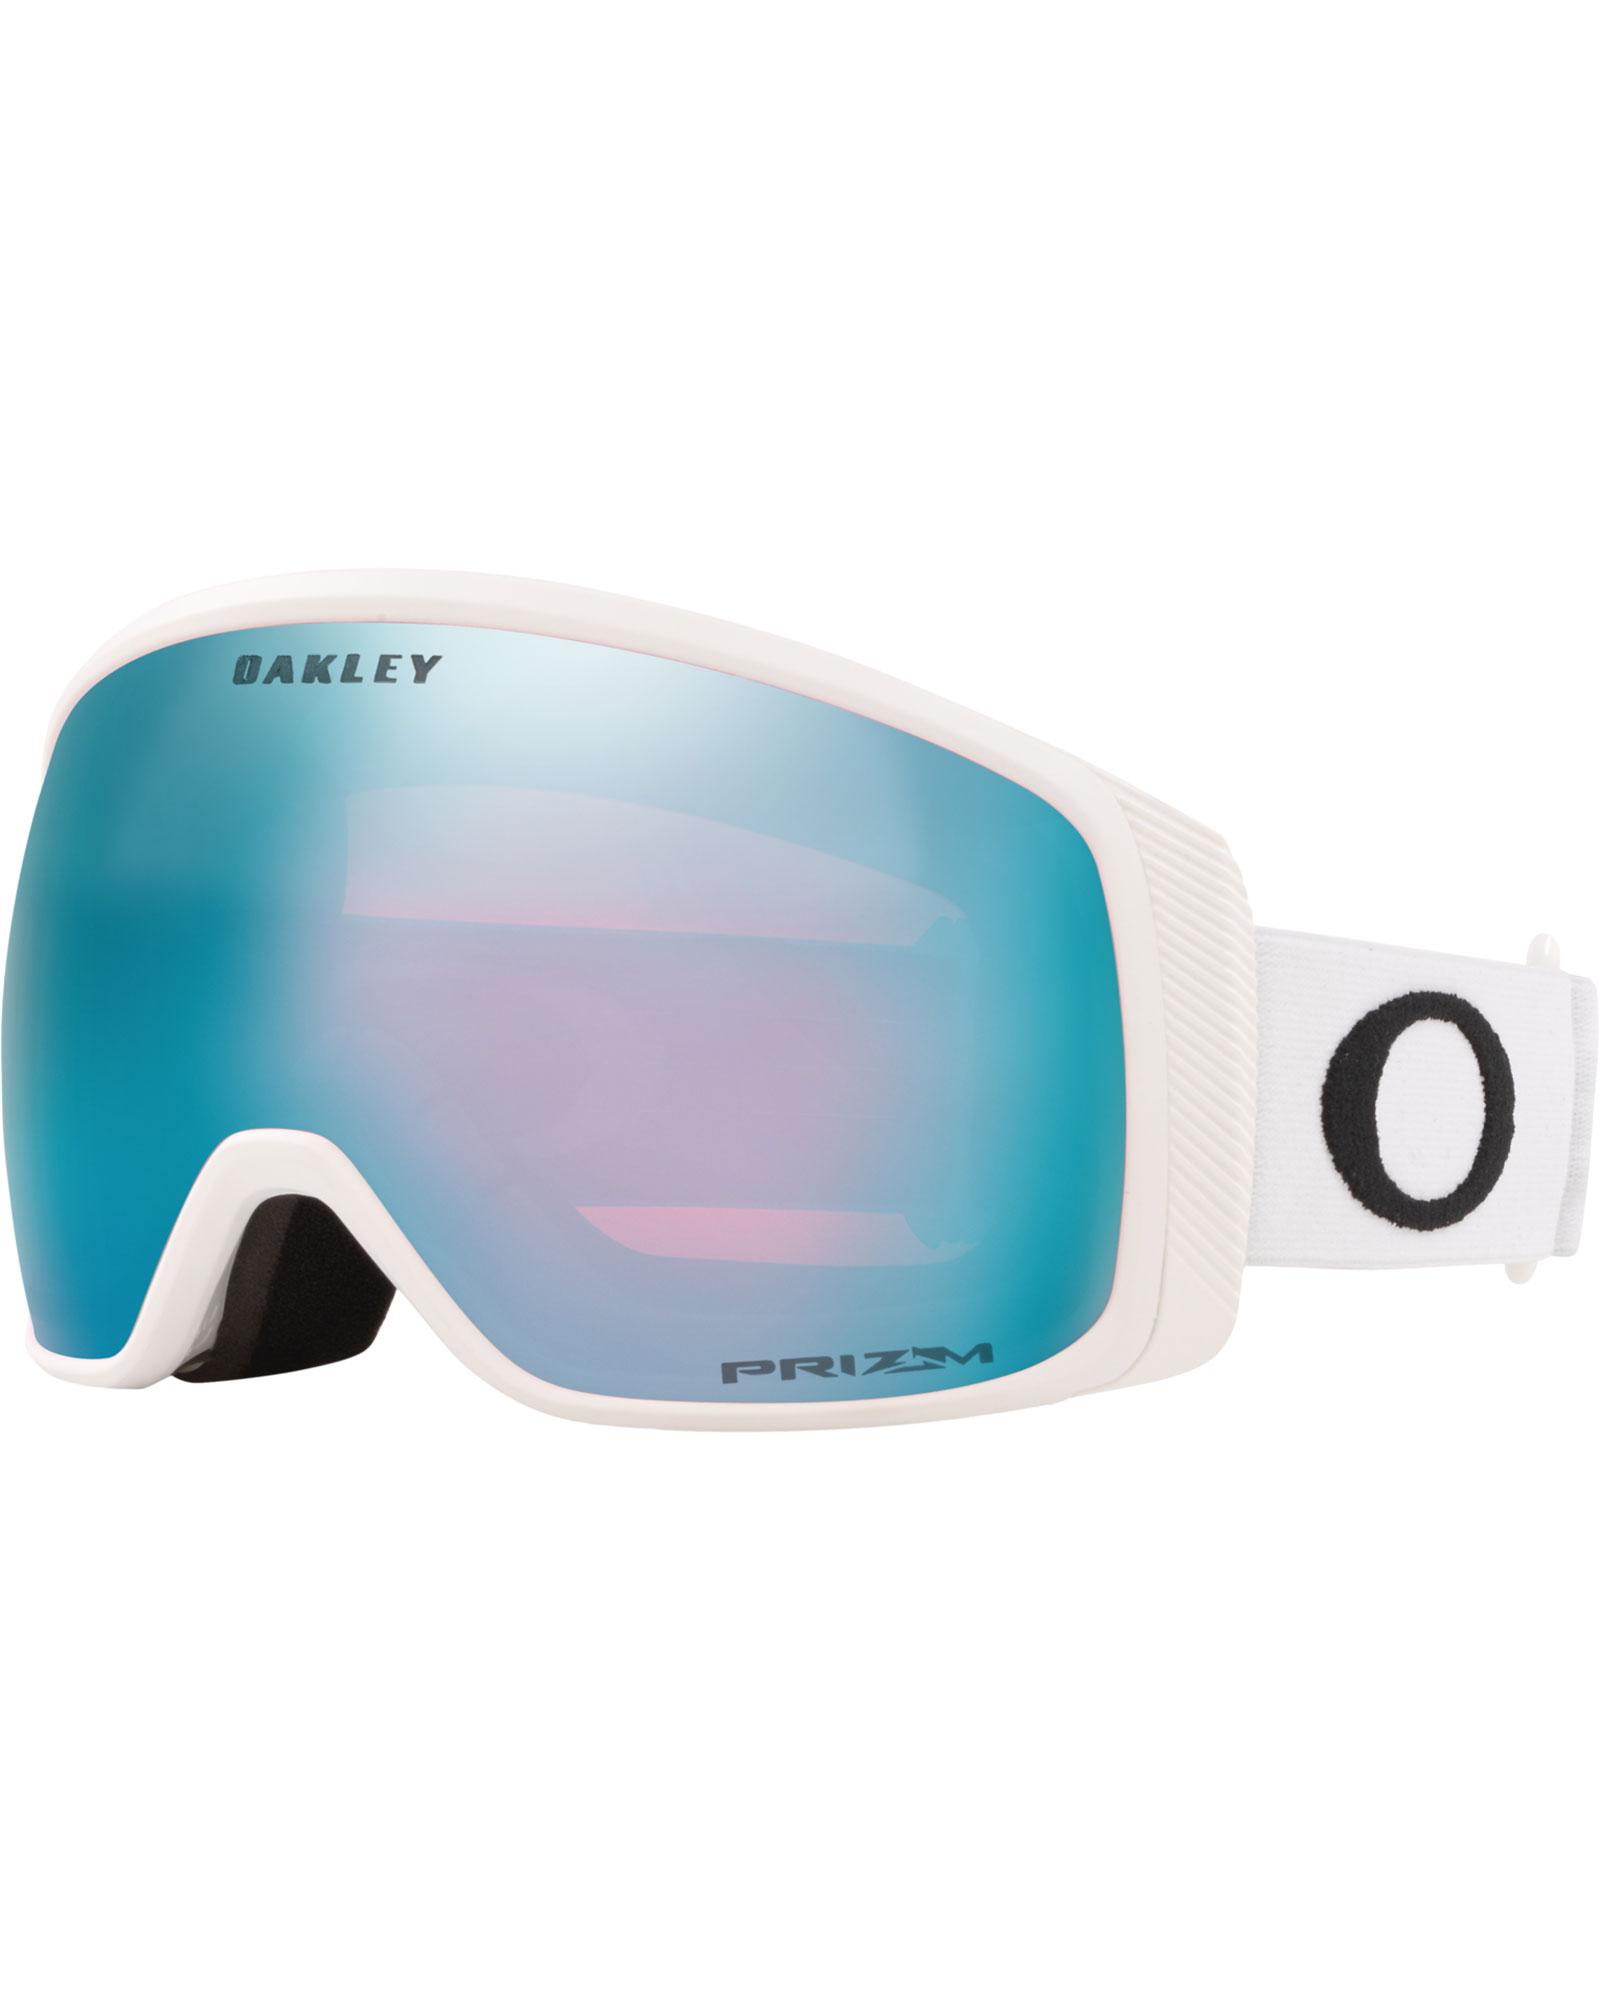 Oakley Flight Tracker XM Matte White / Prizm Sapphire Iridium Goggles 2020 / 2021 0